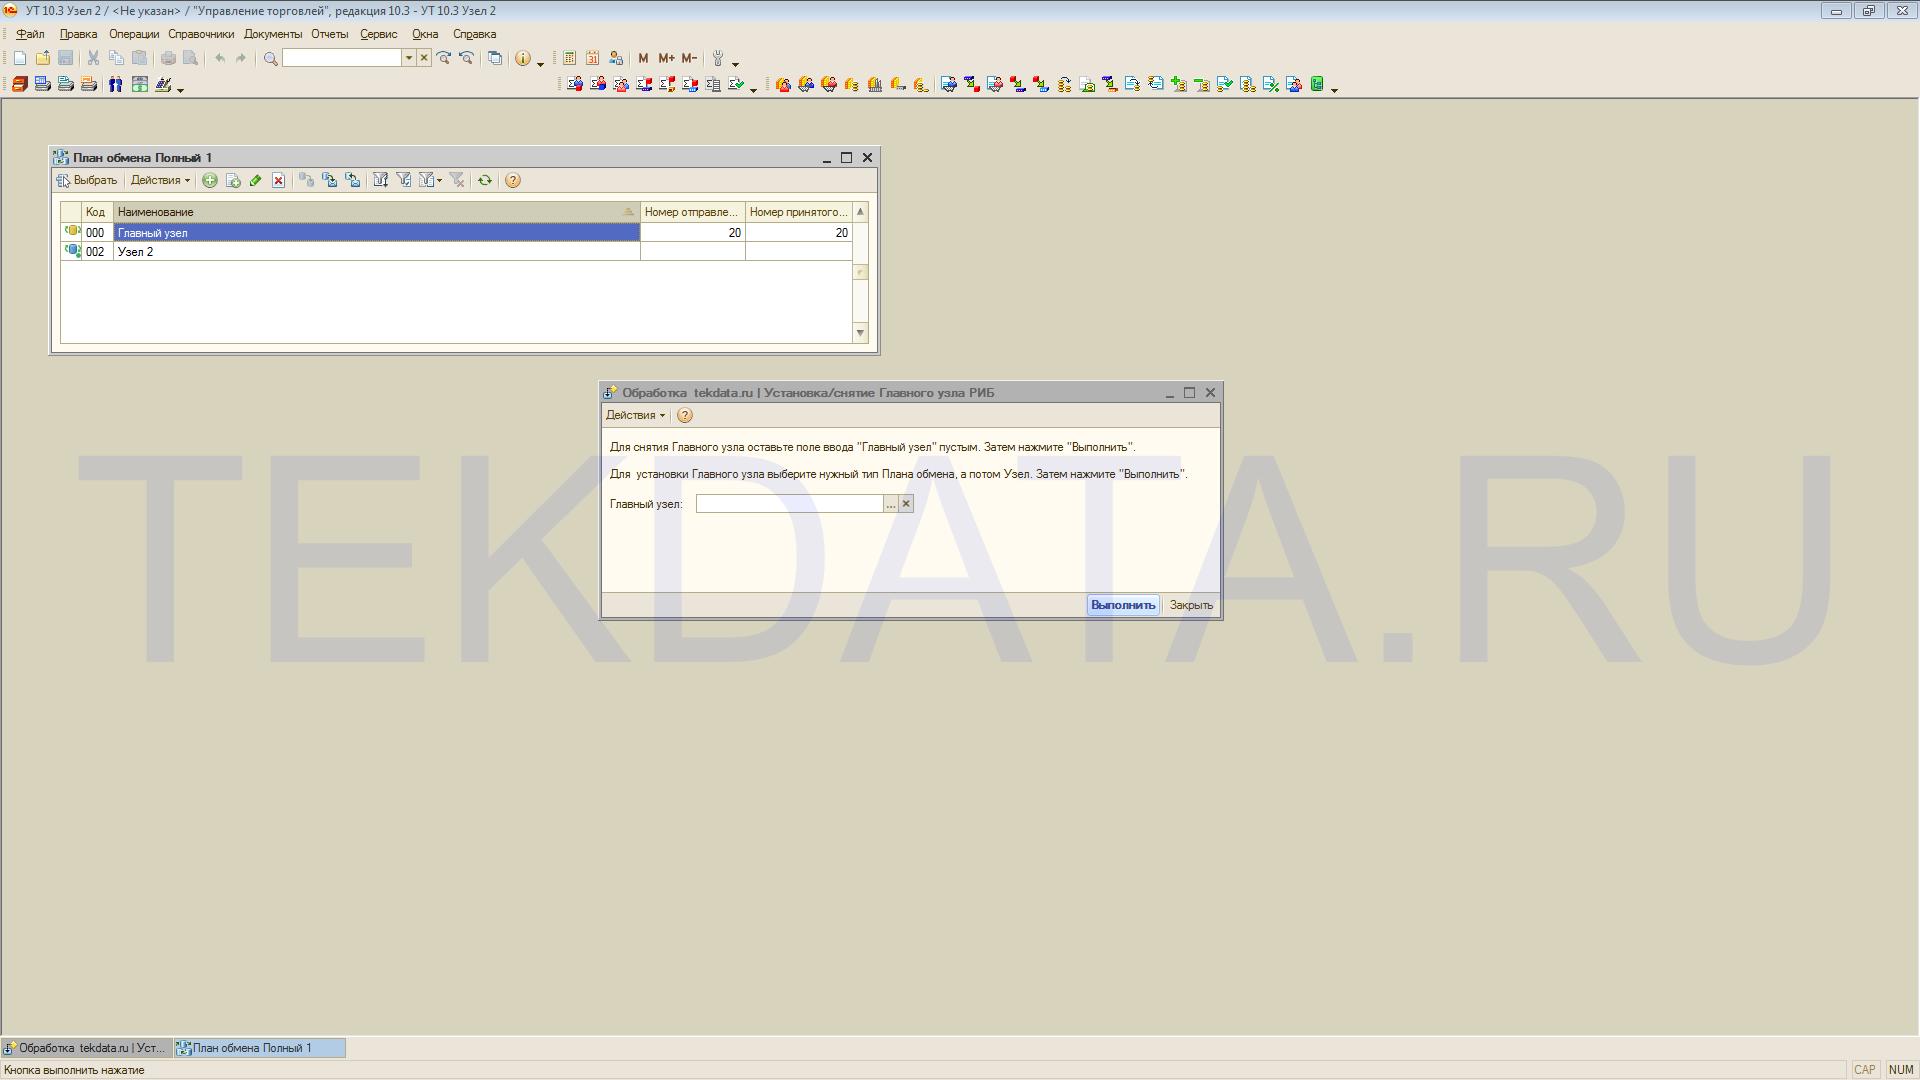 Установка и снятие главного узла РИБ для 1С:Предприятие 8.2 и 8.3 (внешняя обработка *.epf)   tekdata.ru